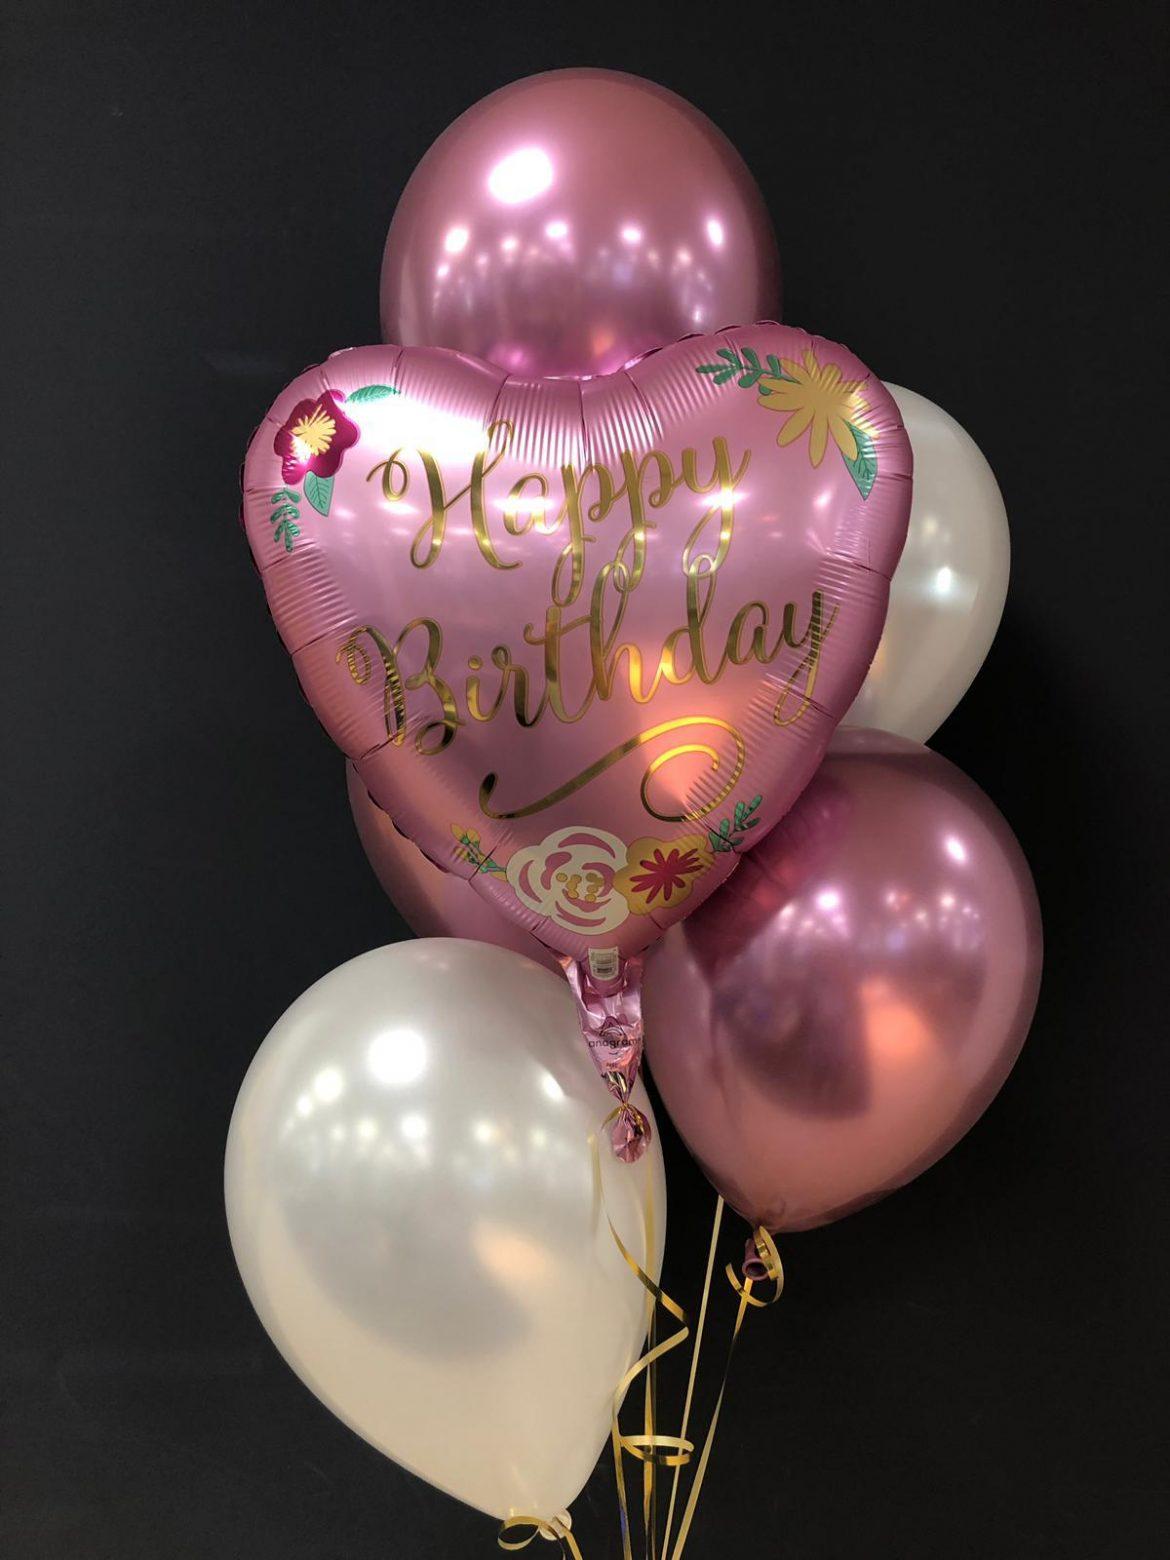 Happy Birthday €5,50<br />Latexballons je €1,95 1